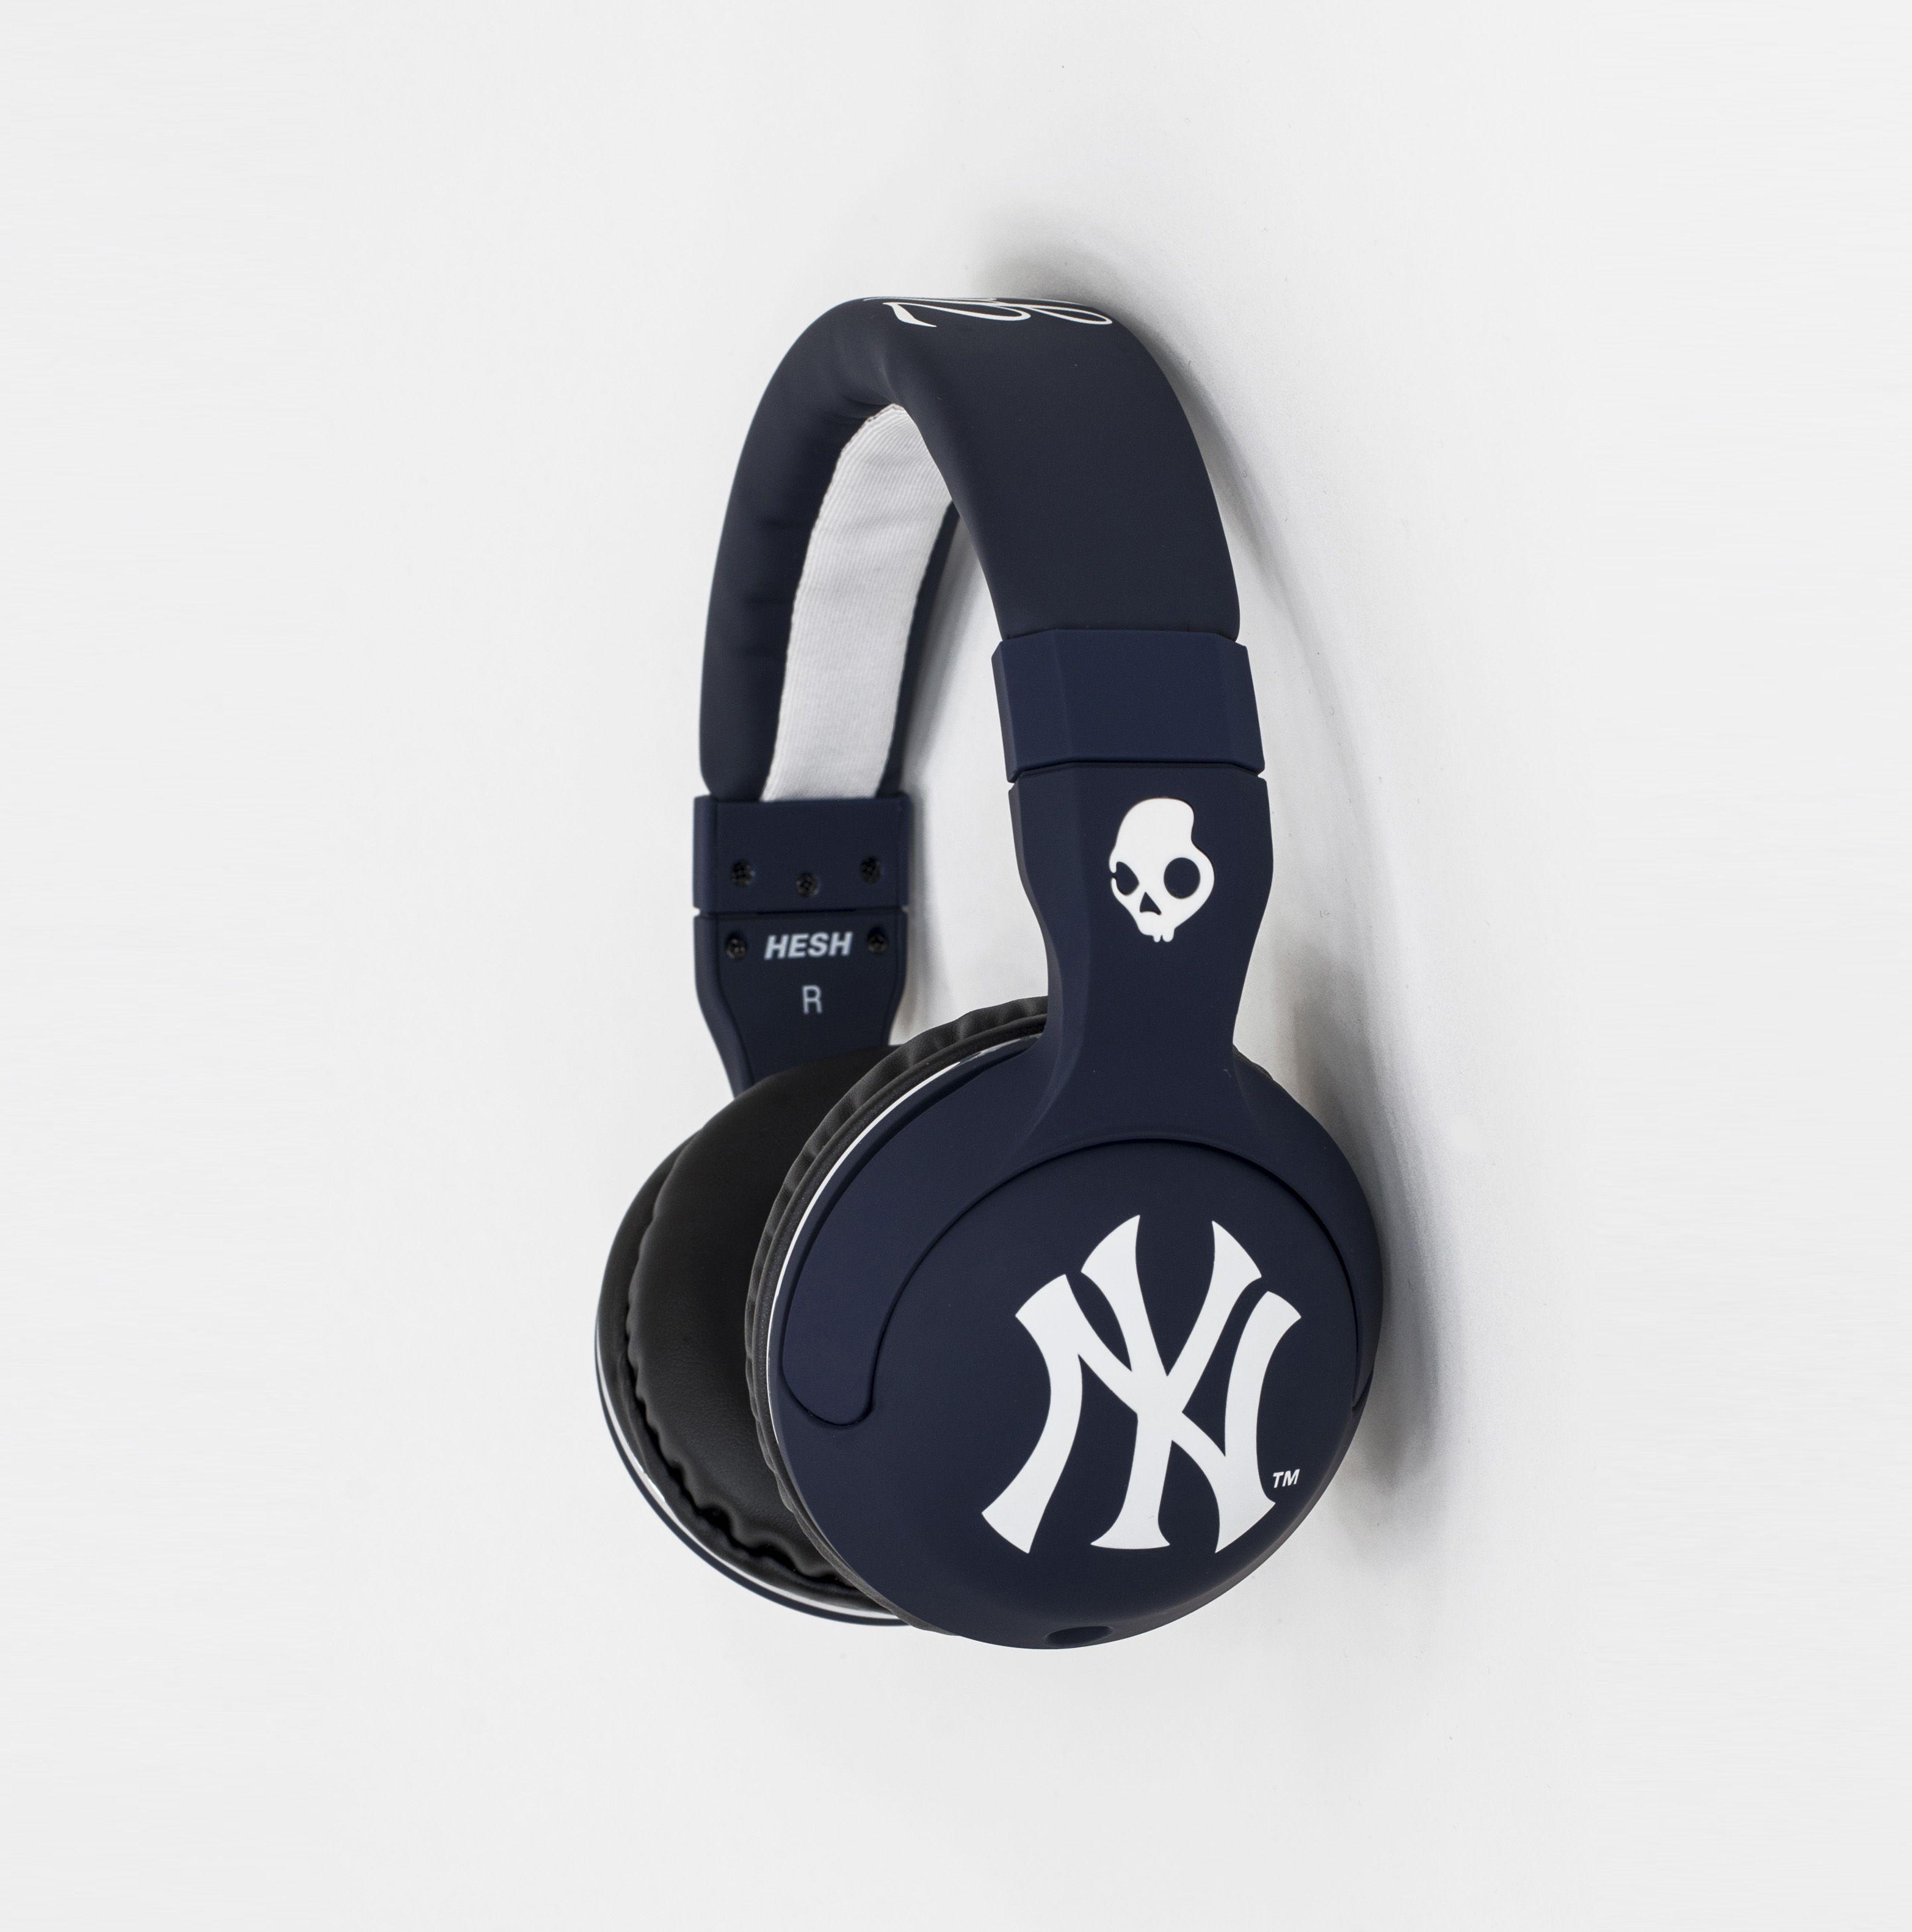 New York Yankees Bedroom Decor Ny Yankees Skullcandy Headphones New York Yankees Baseball Diy